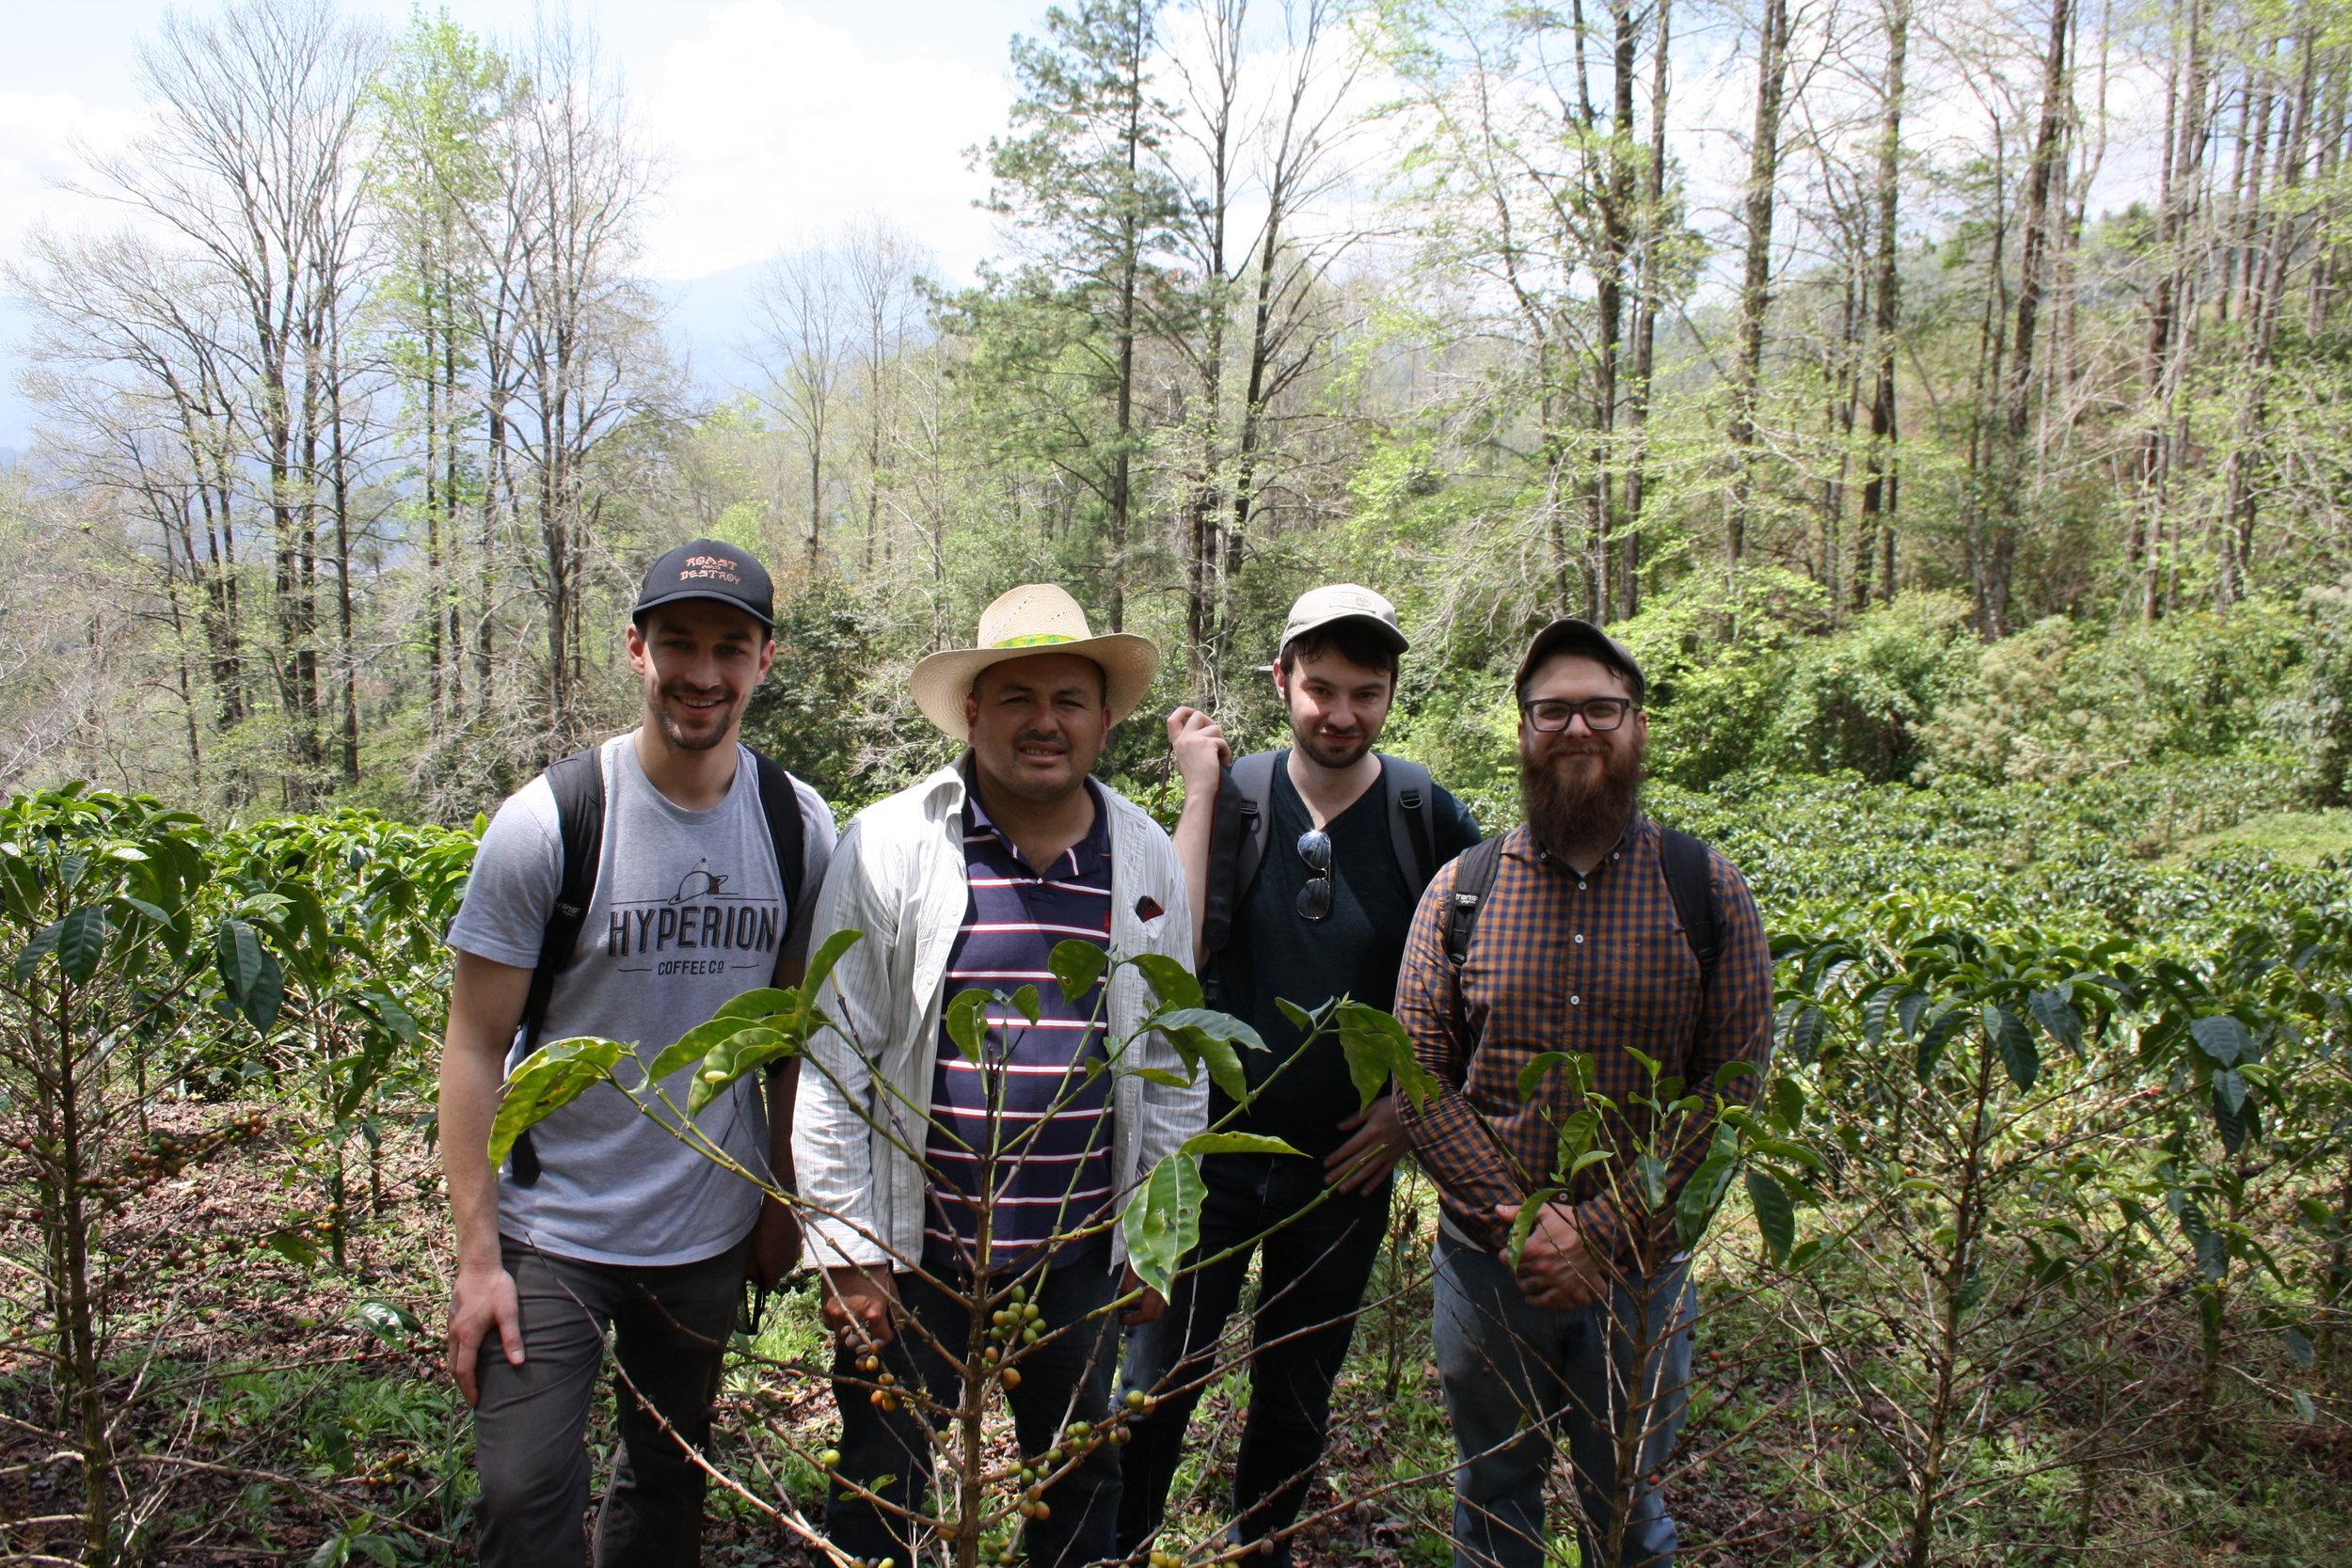 Hyperion at Rolando Carcamo's Farm. From left to right; Dan Kubera, Rolando Carcamo, Alex Merz, and Eric Mullins in Quiscamote, Honduras.